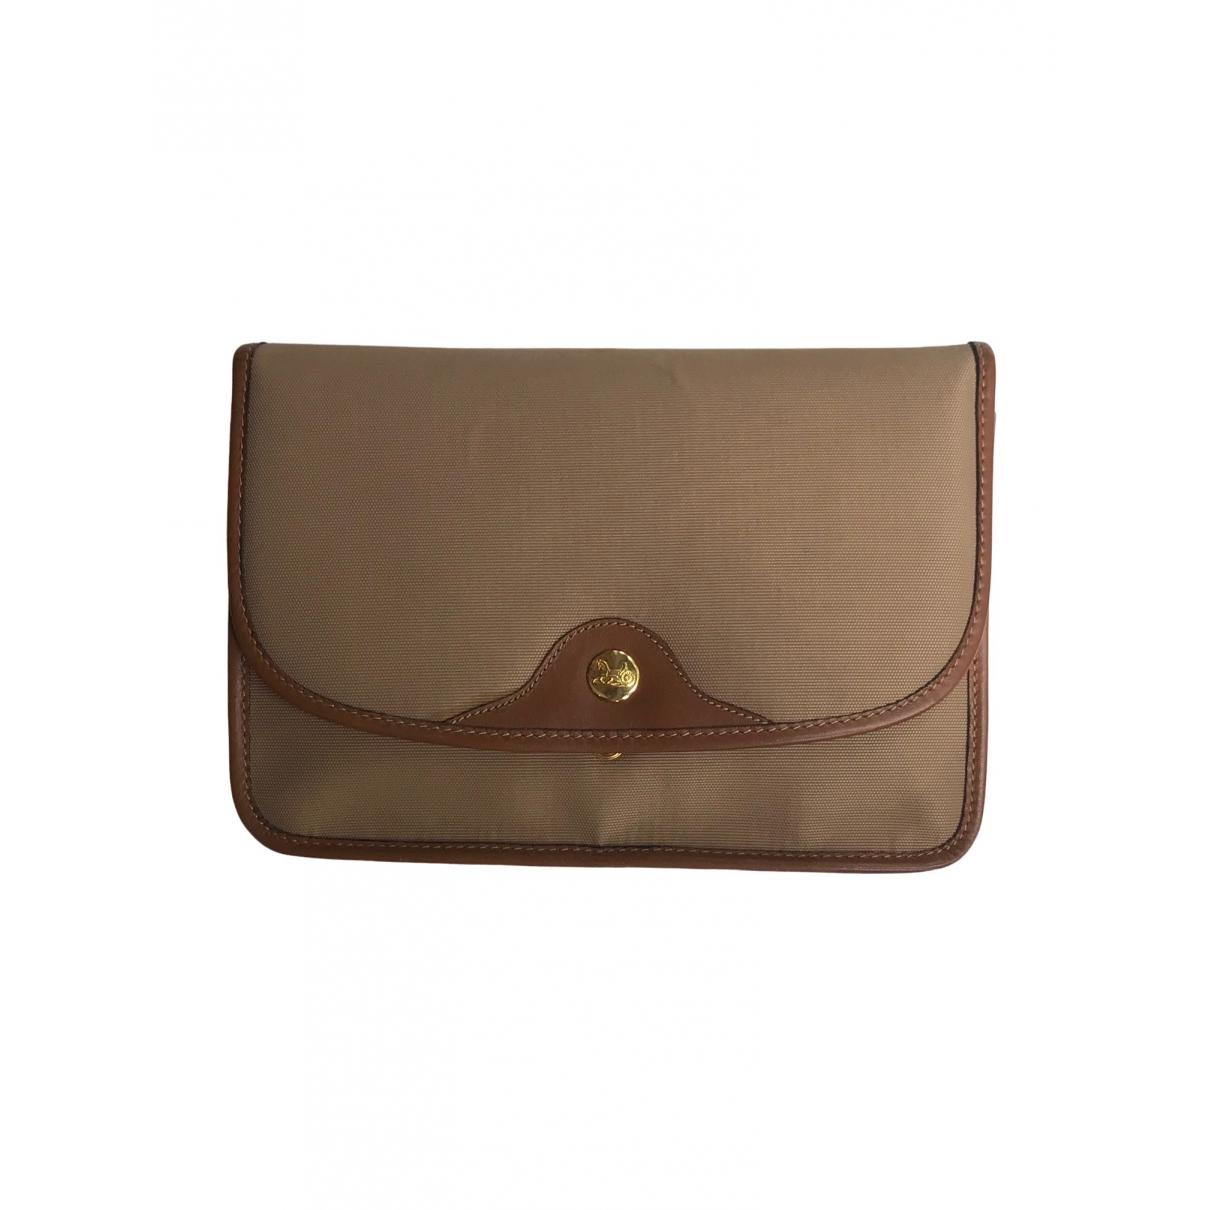 Celine \N Beige Cloth Clutch bag for Women \N